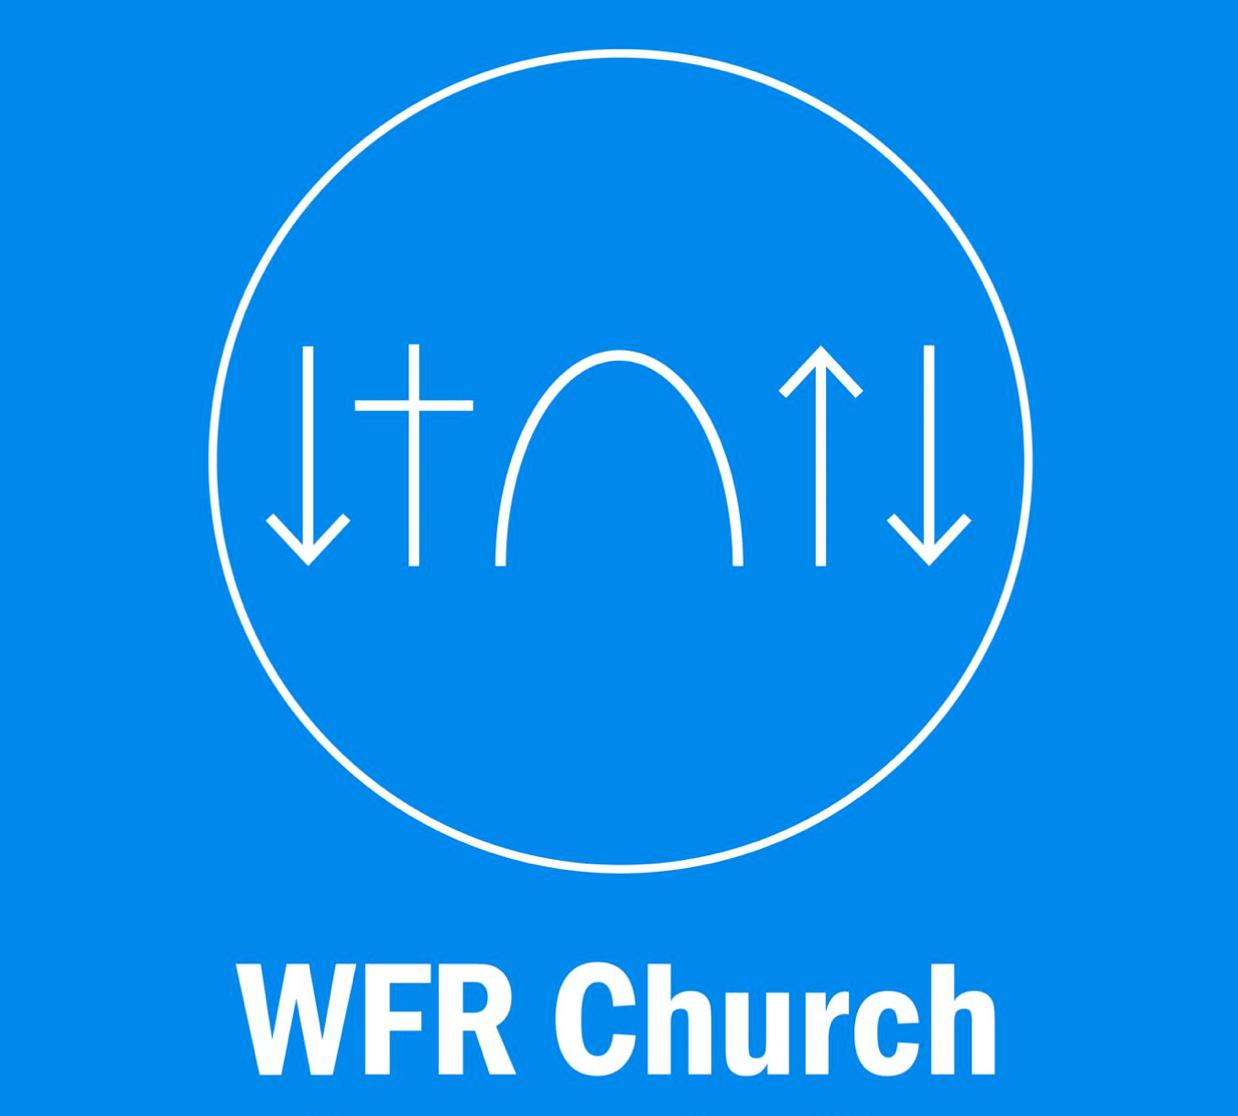 best-christian-churches-WFR-Church-west-monroe-la